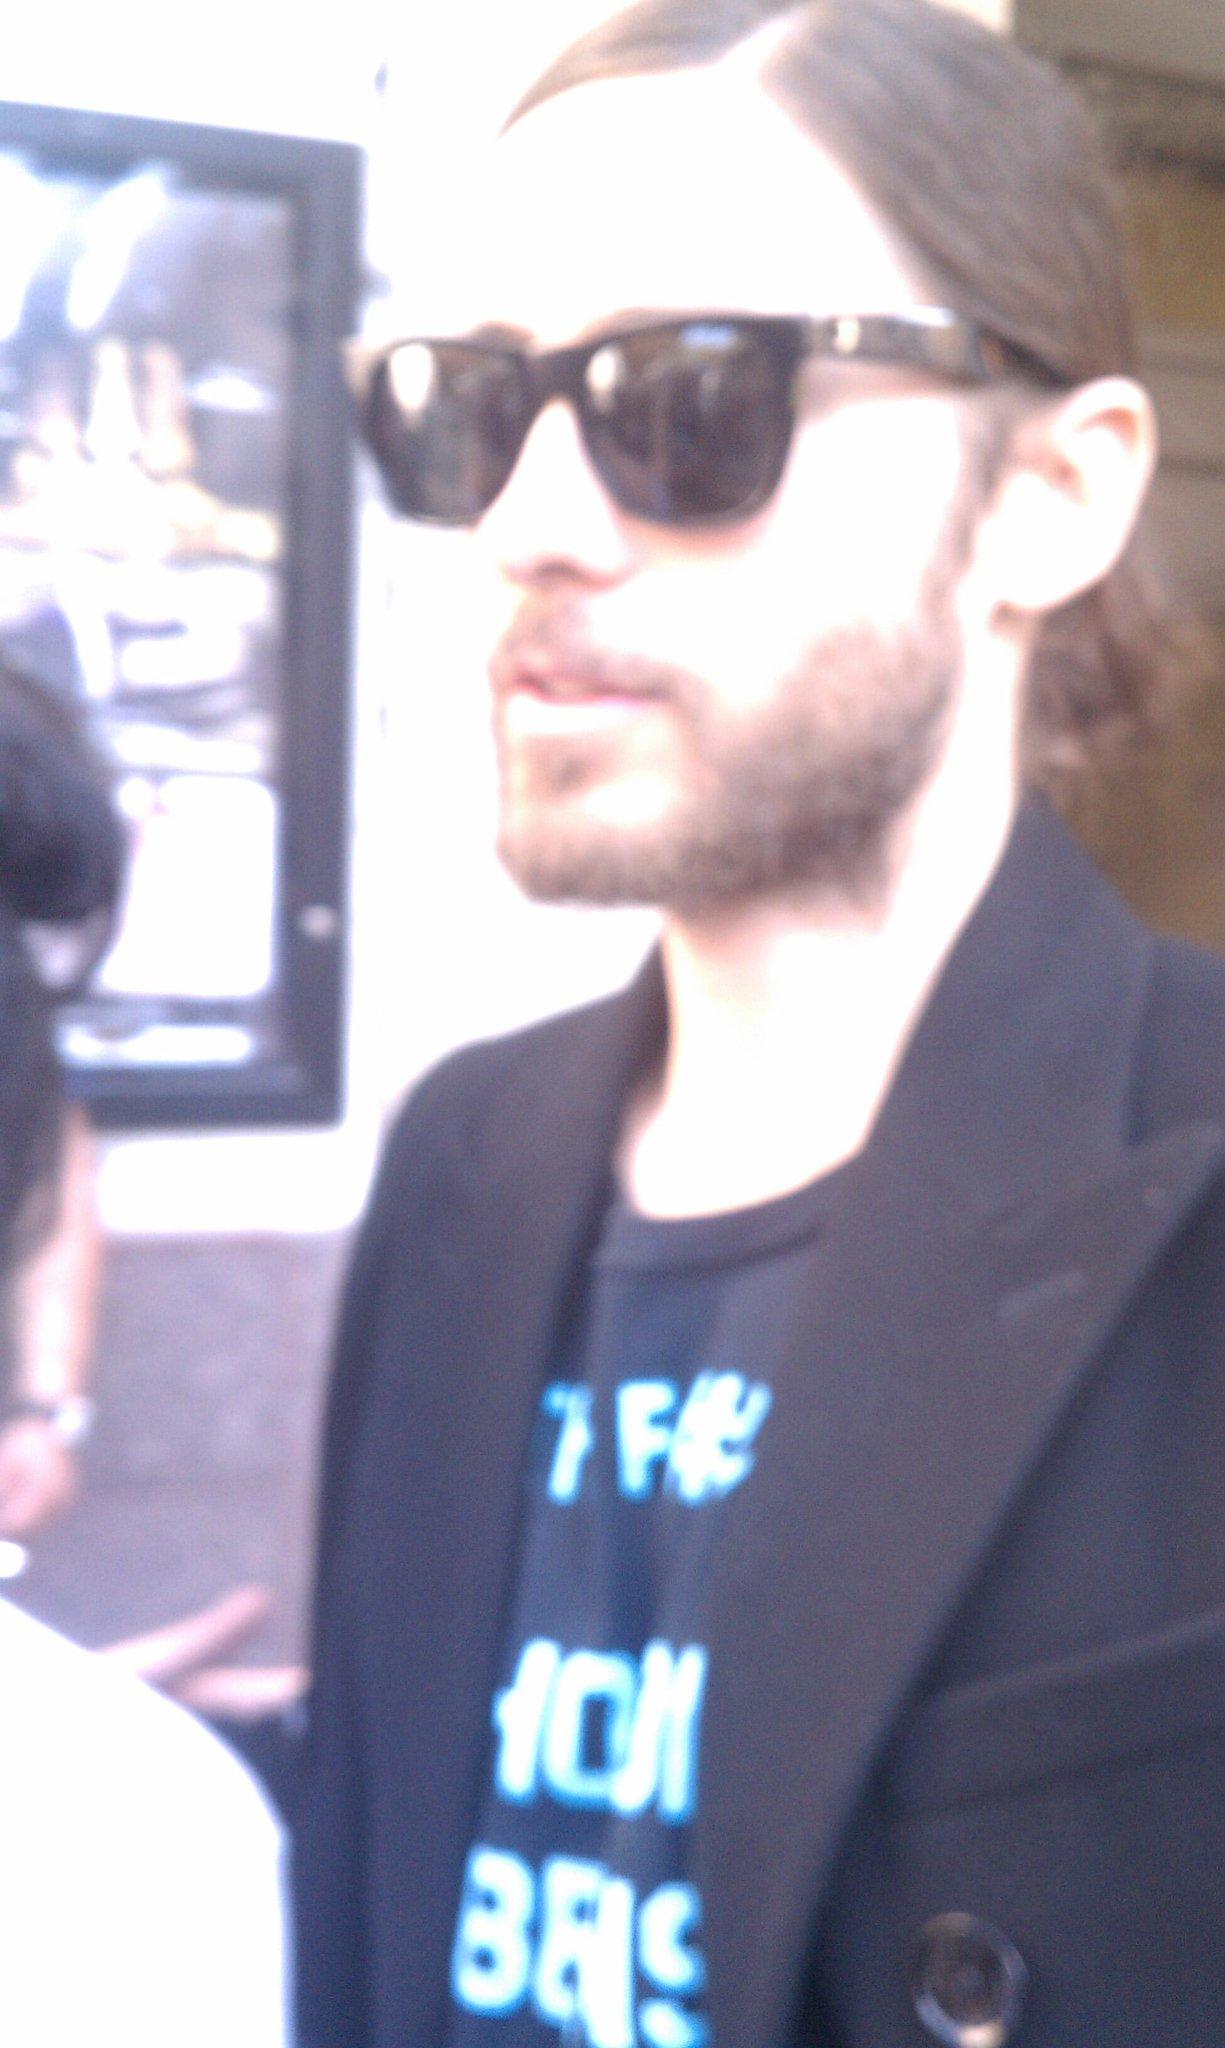 13 mars 2013 Jared au SXSW pour Artifact à Austin BFRGSijCEAAnKCx